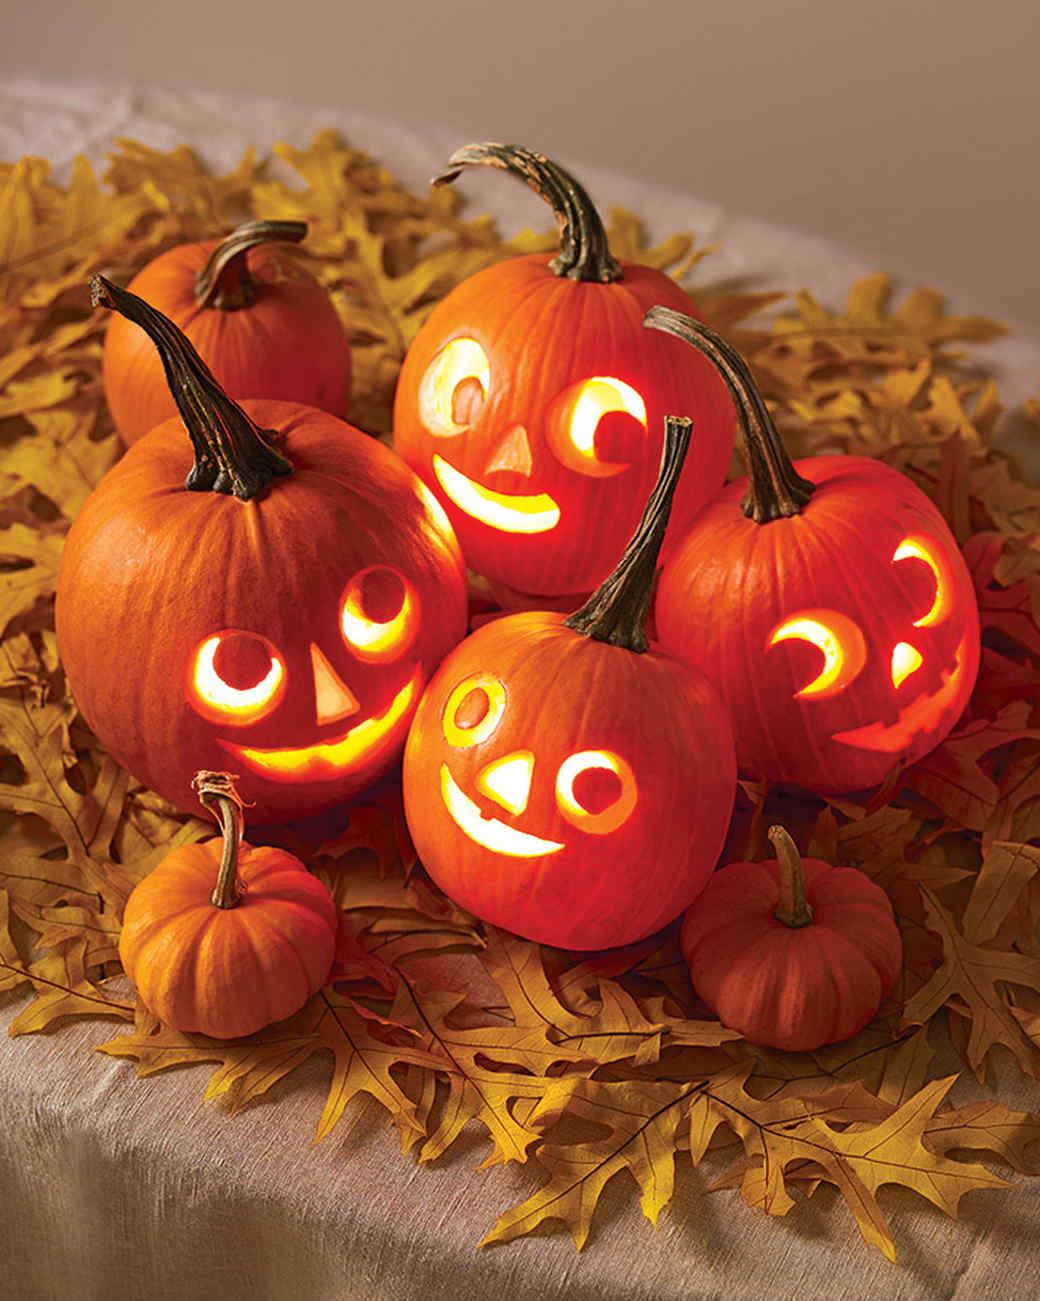 ml105470_1010_patch238_smile_pumpkin.jpg